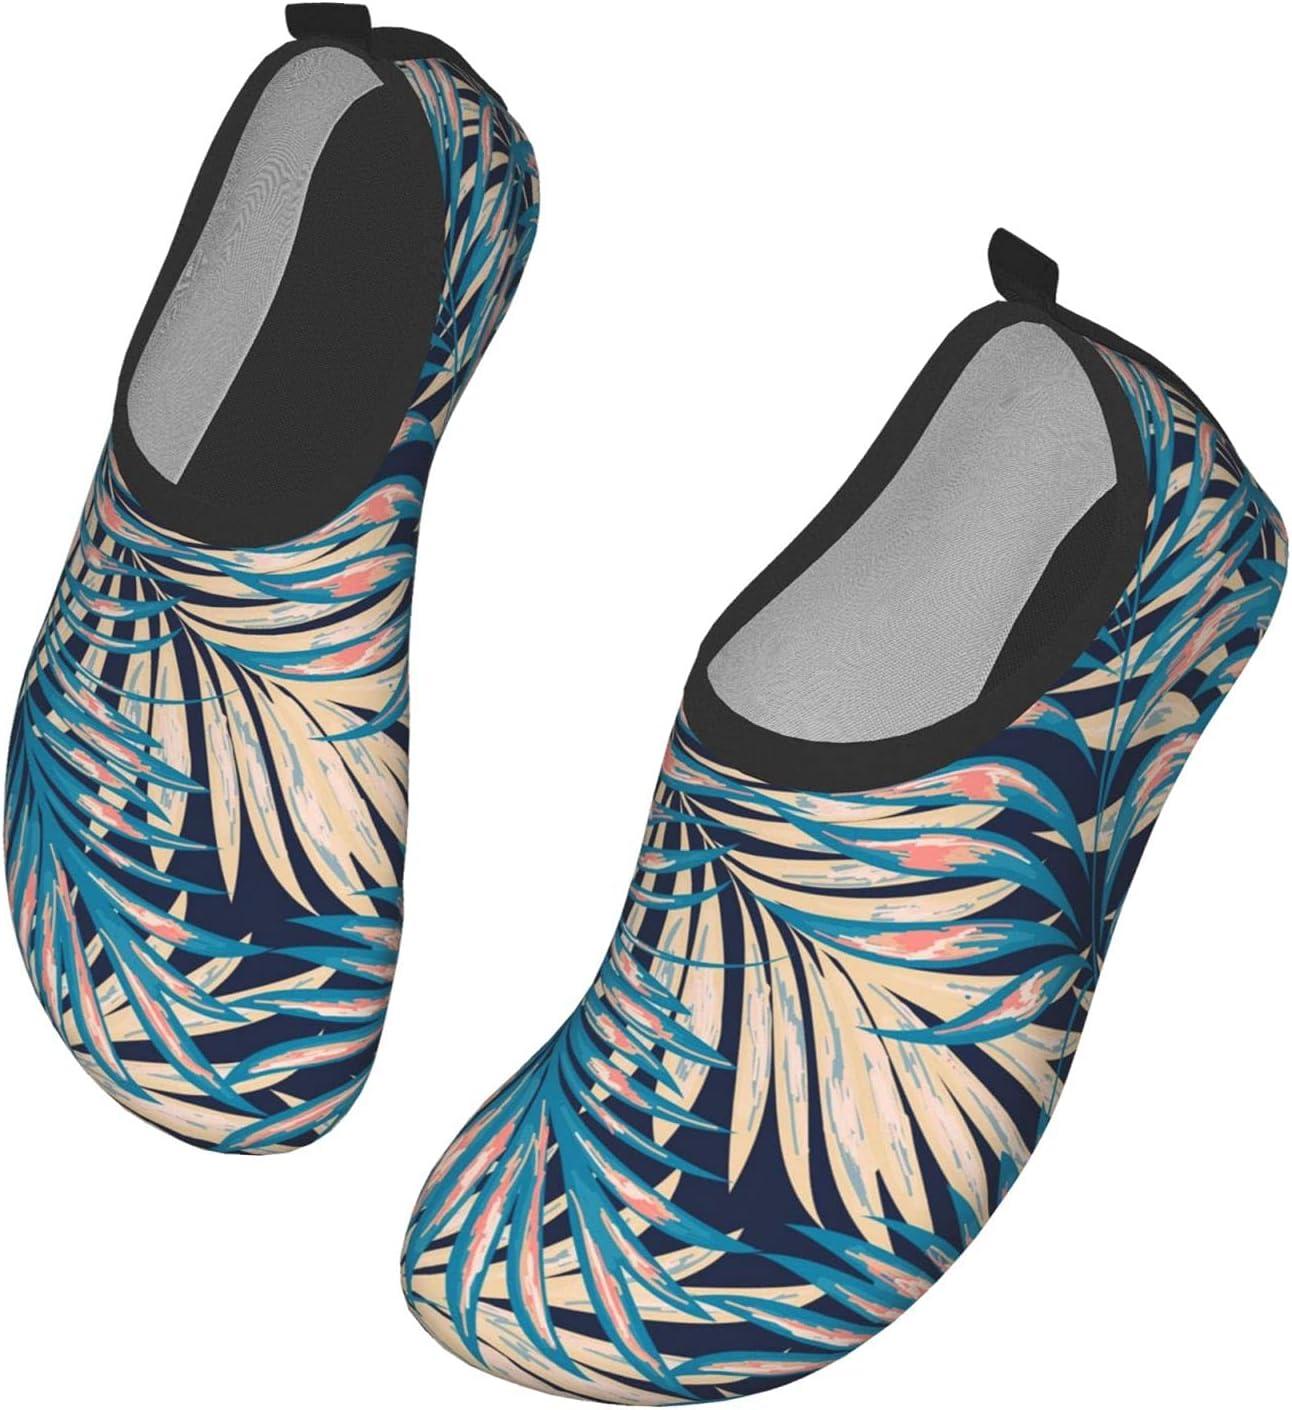 NA Beautiful Large Leaf Pattern Men's Women's Water Shoes Barefoot Quick Dry Slip-On Aqua Socks for Yoga Beach Sports Swim Surf